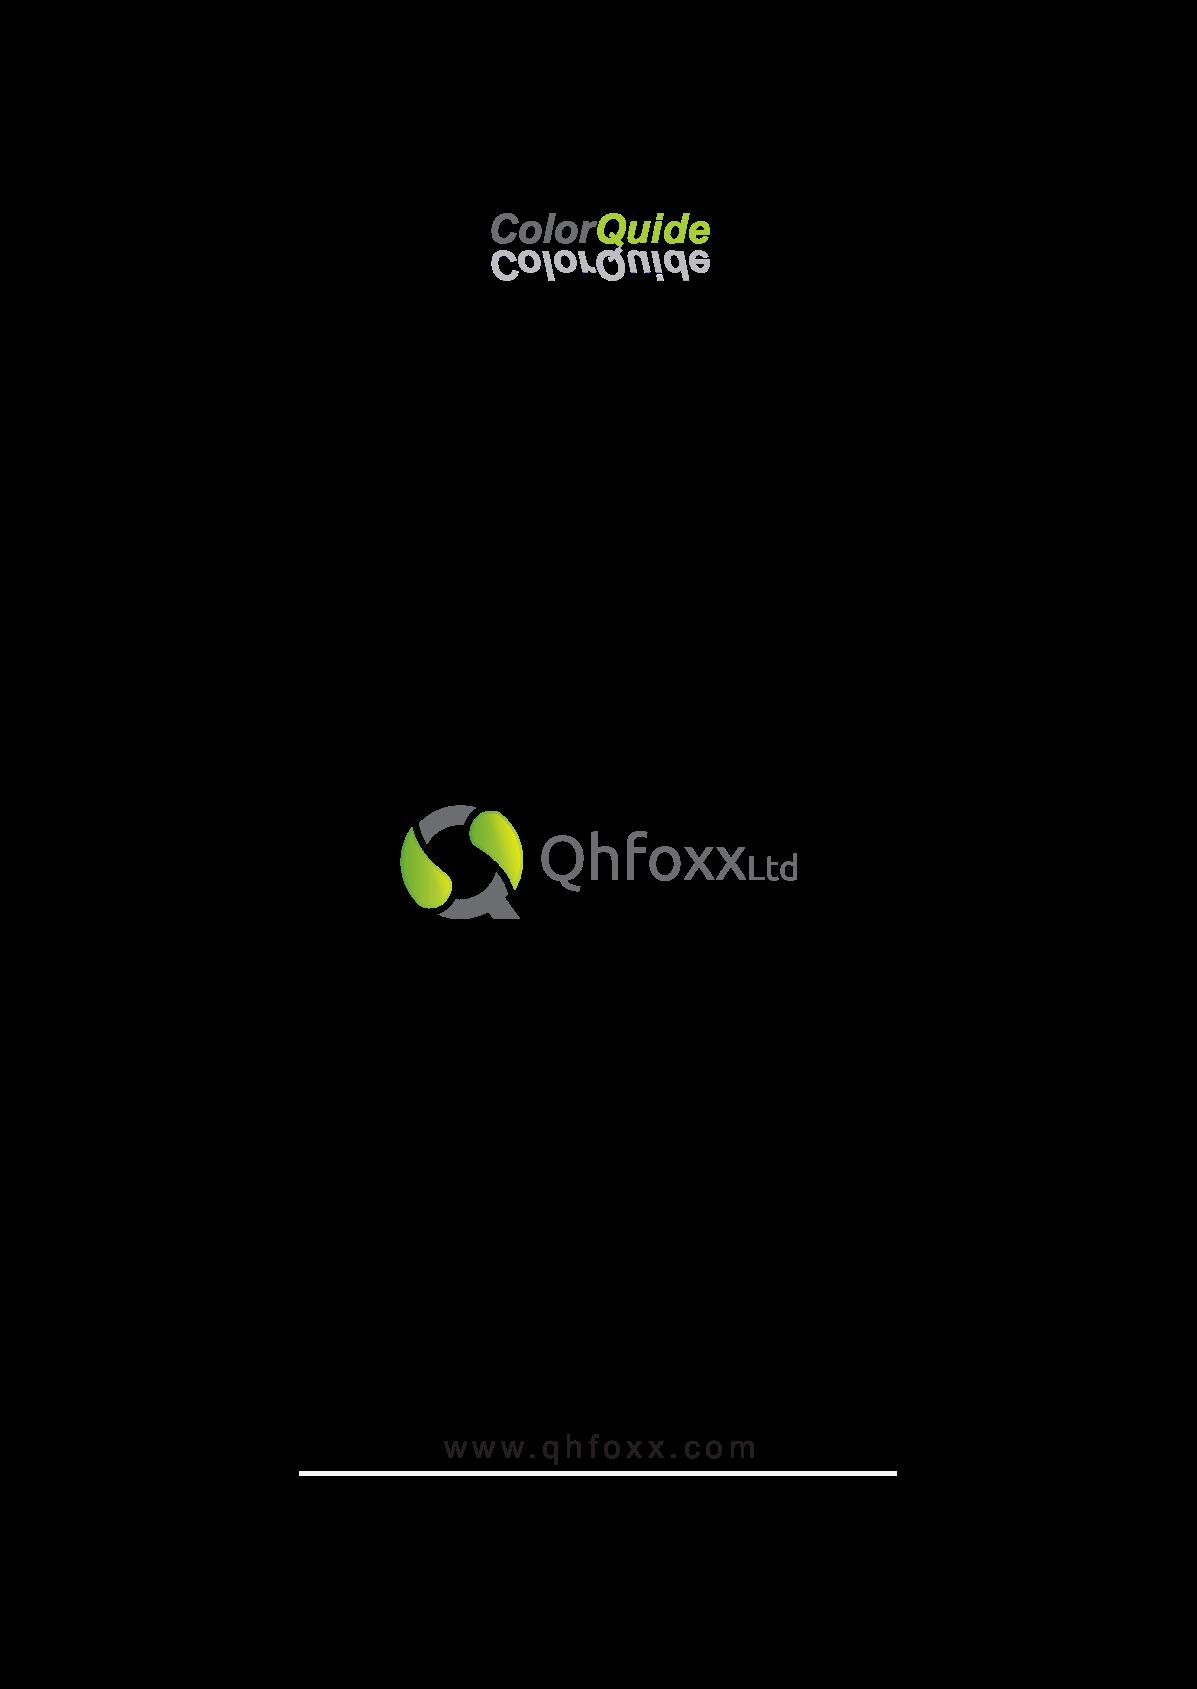 Logo/Business card and letterhead